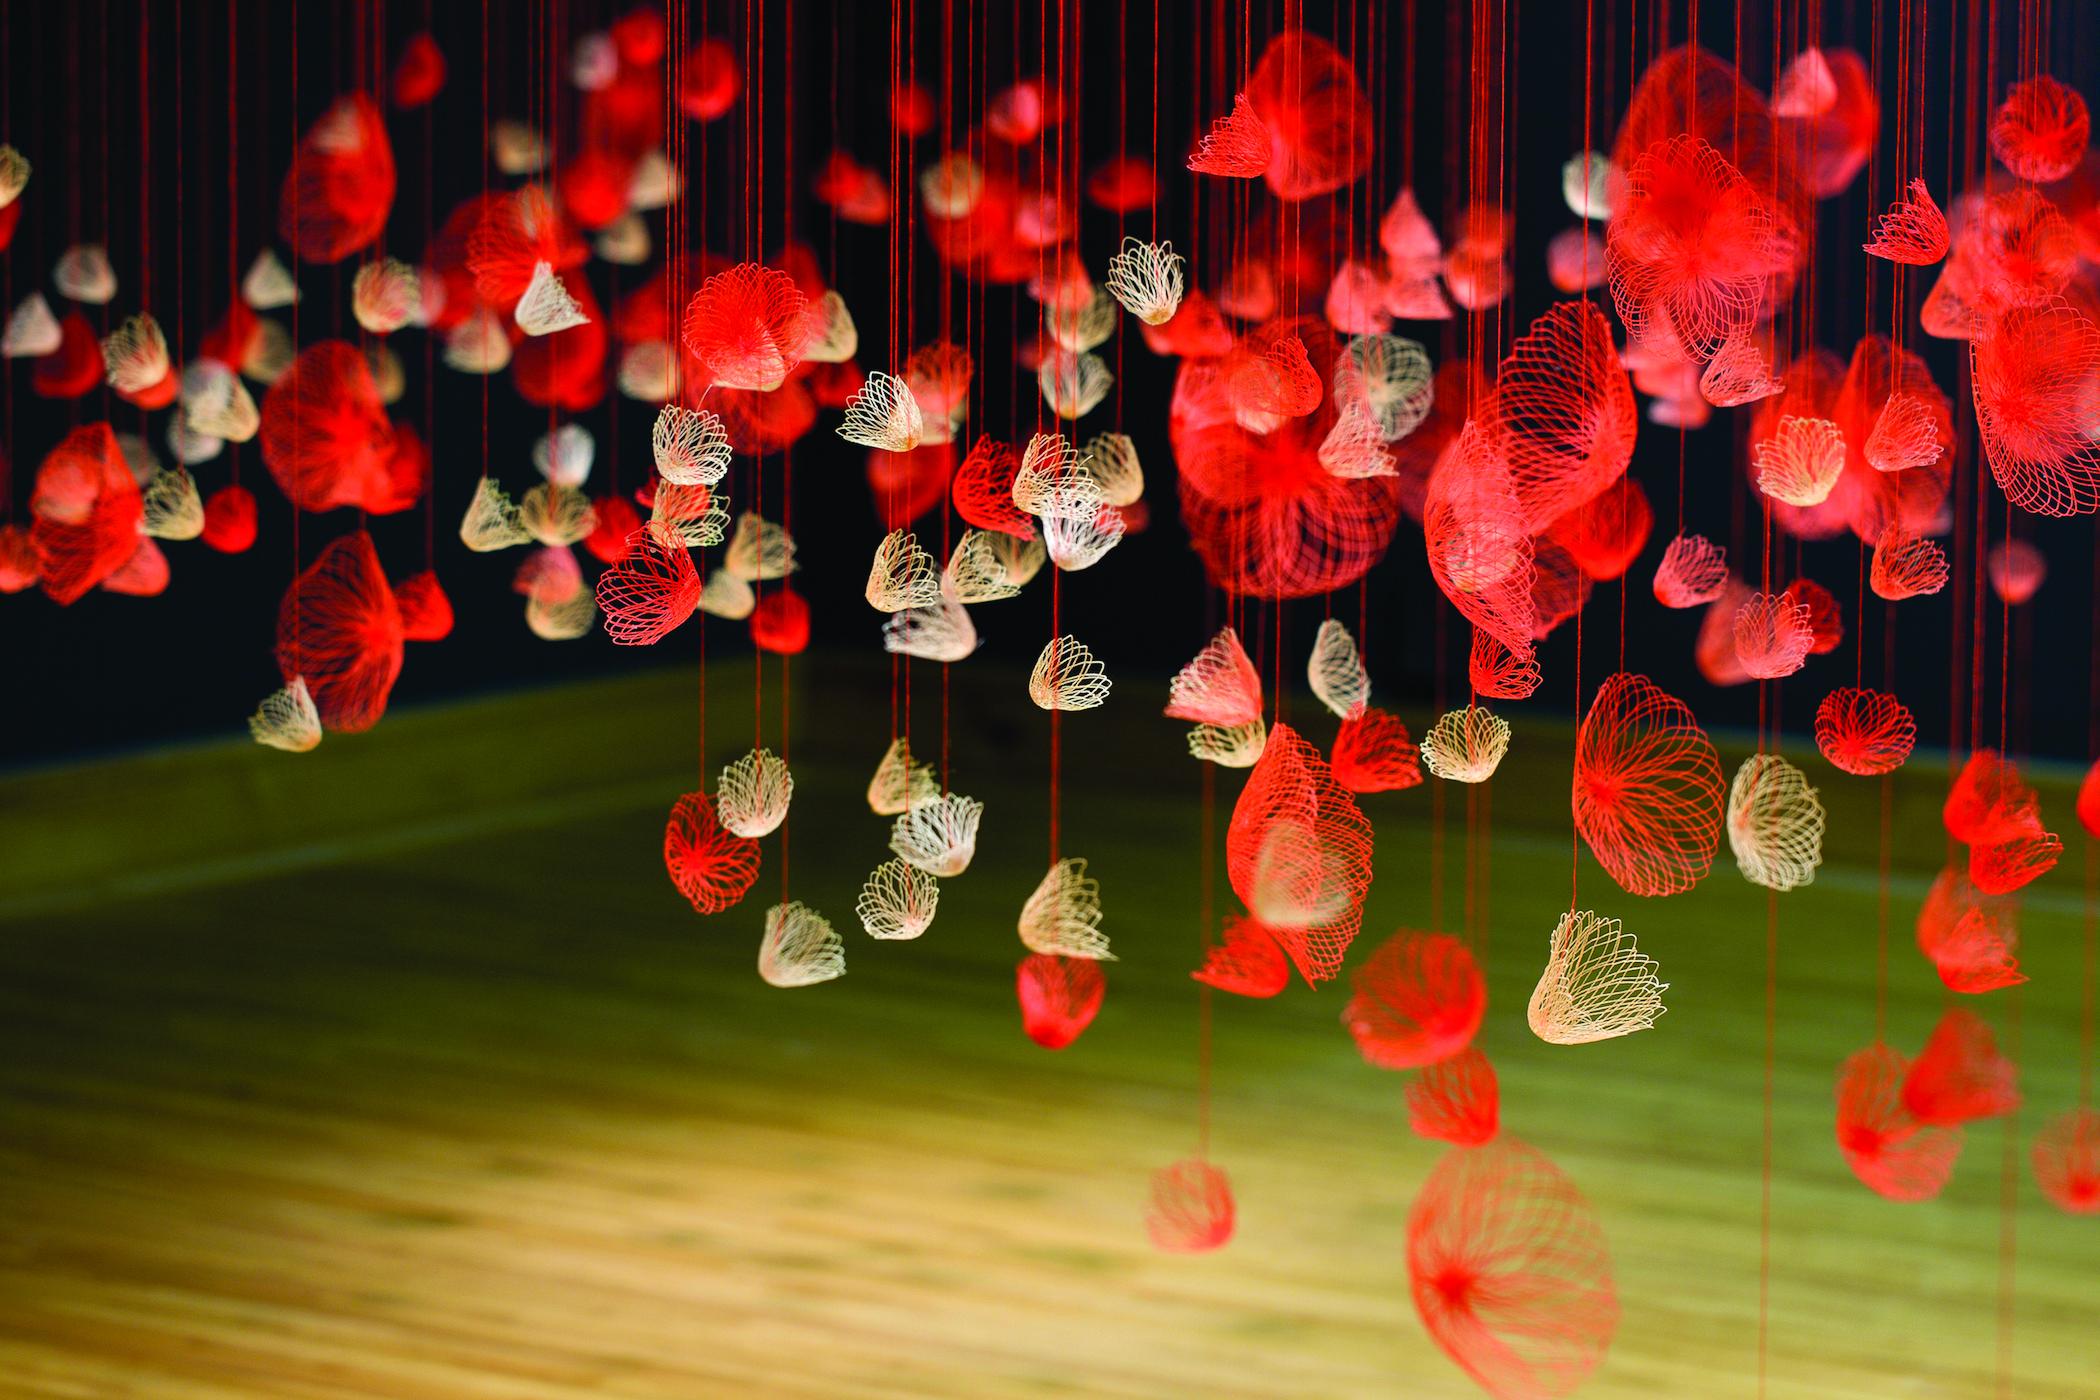 Amanda McCavour, Neon Bloom 2014 – 15, Thread/machine embroidery